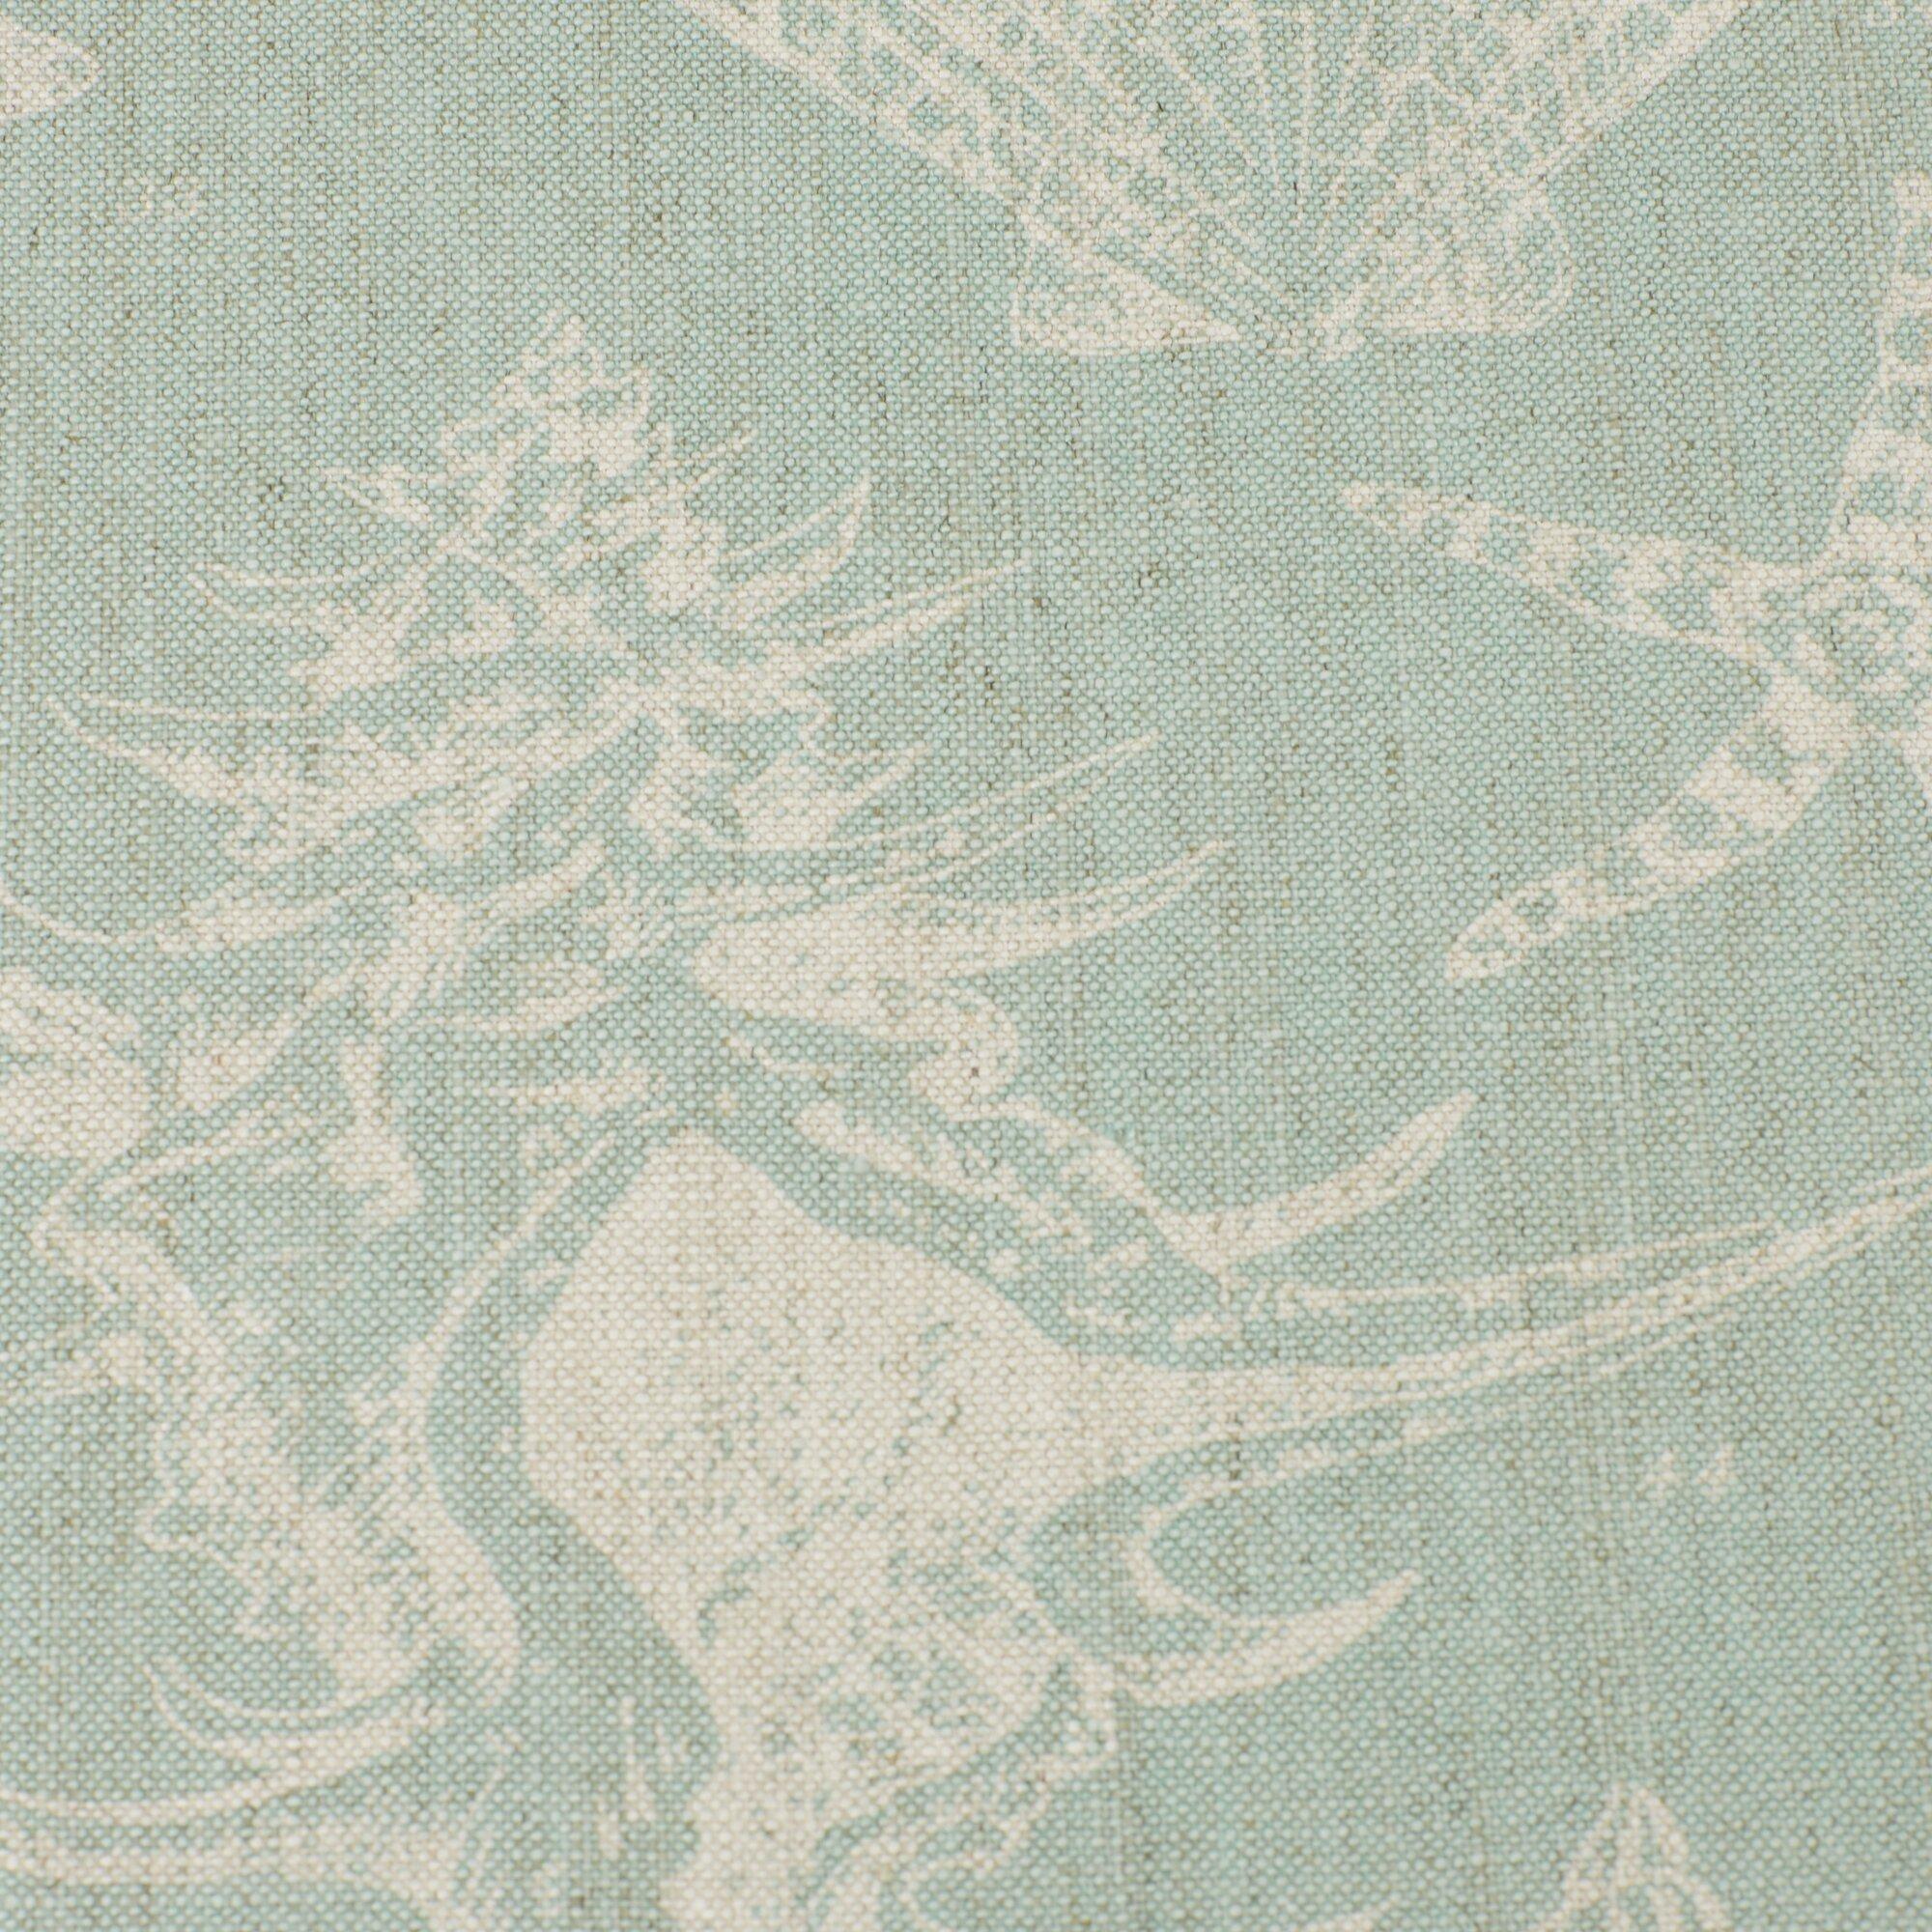 123 Creations Coastal Seashells Linen Upholstered Vanity